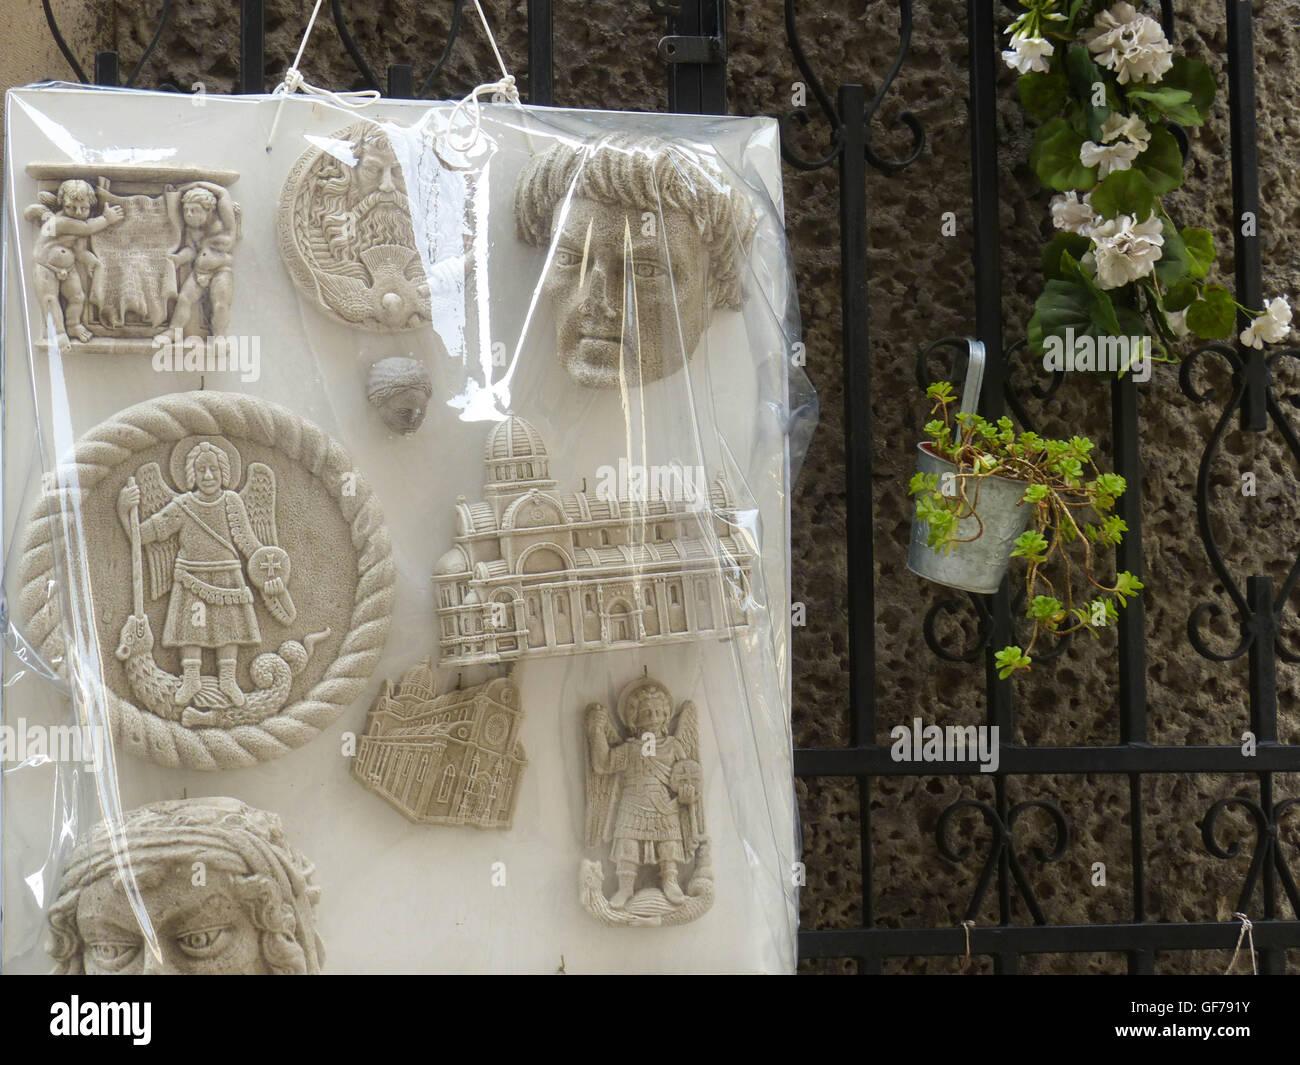 Religious items for sale outside theater Sibernik,Croatia - Stock Image